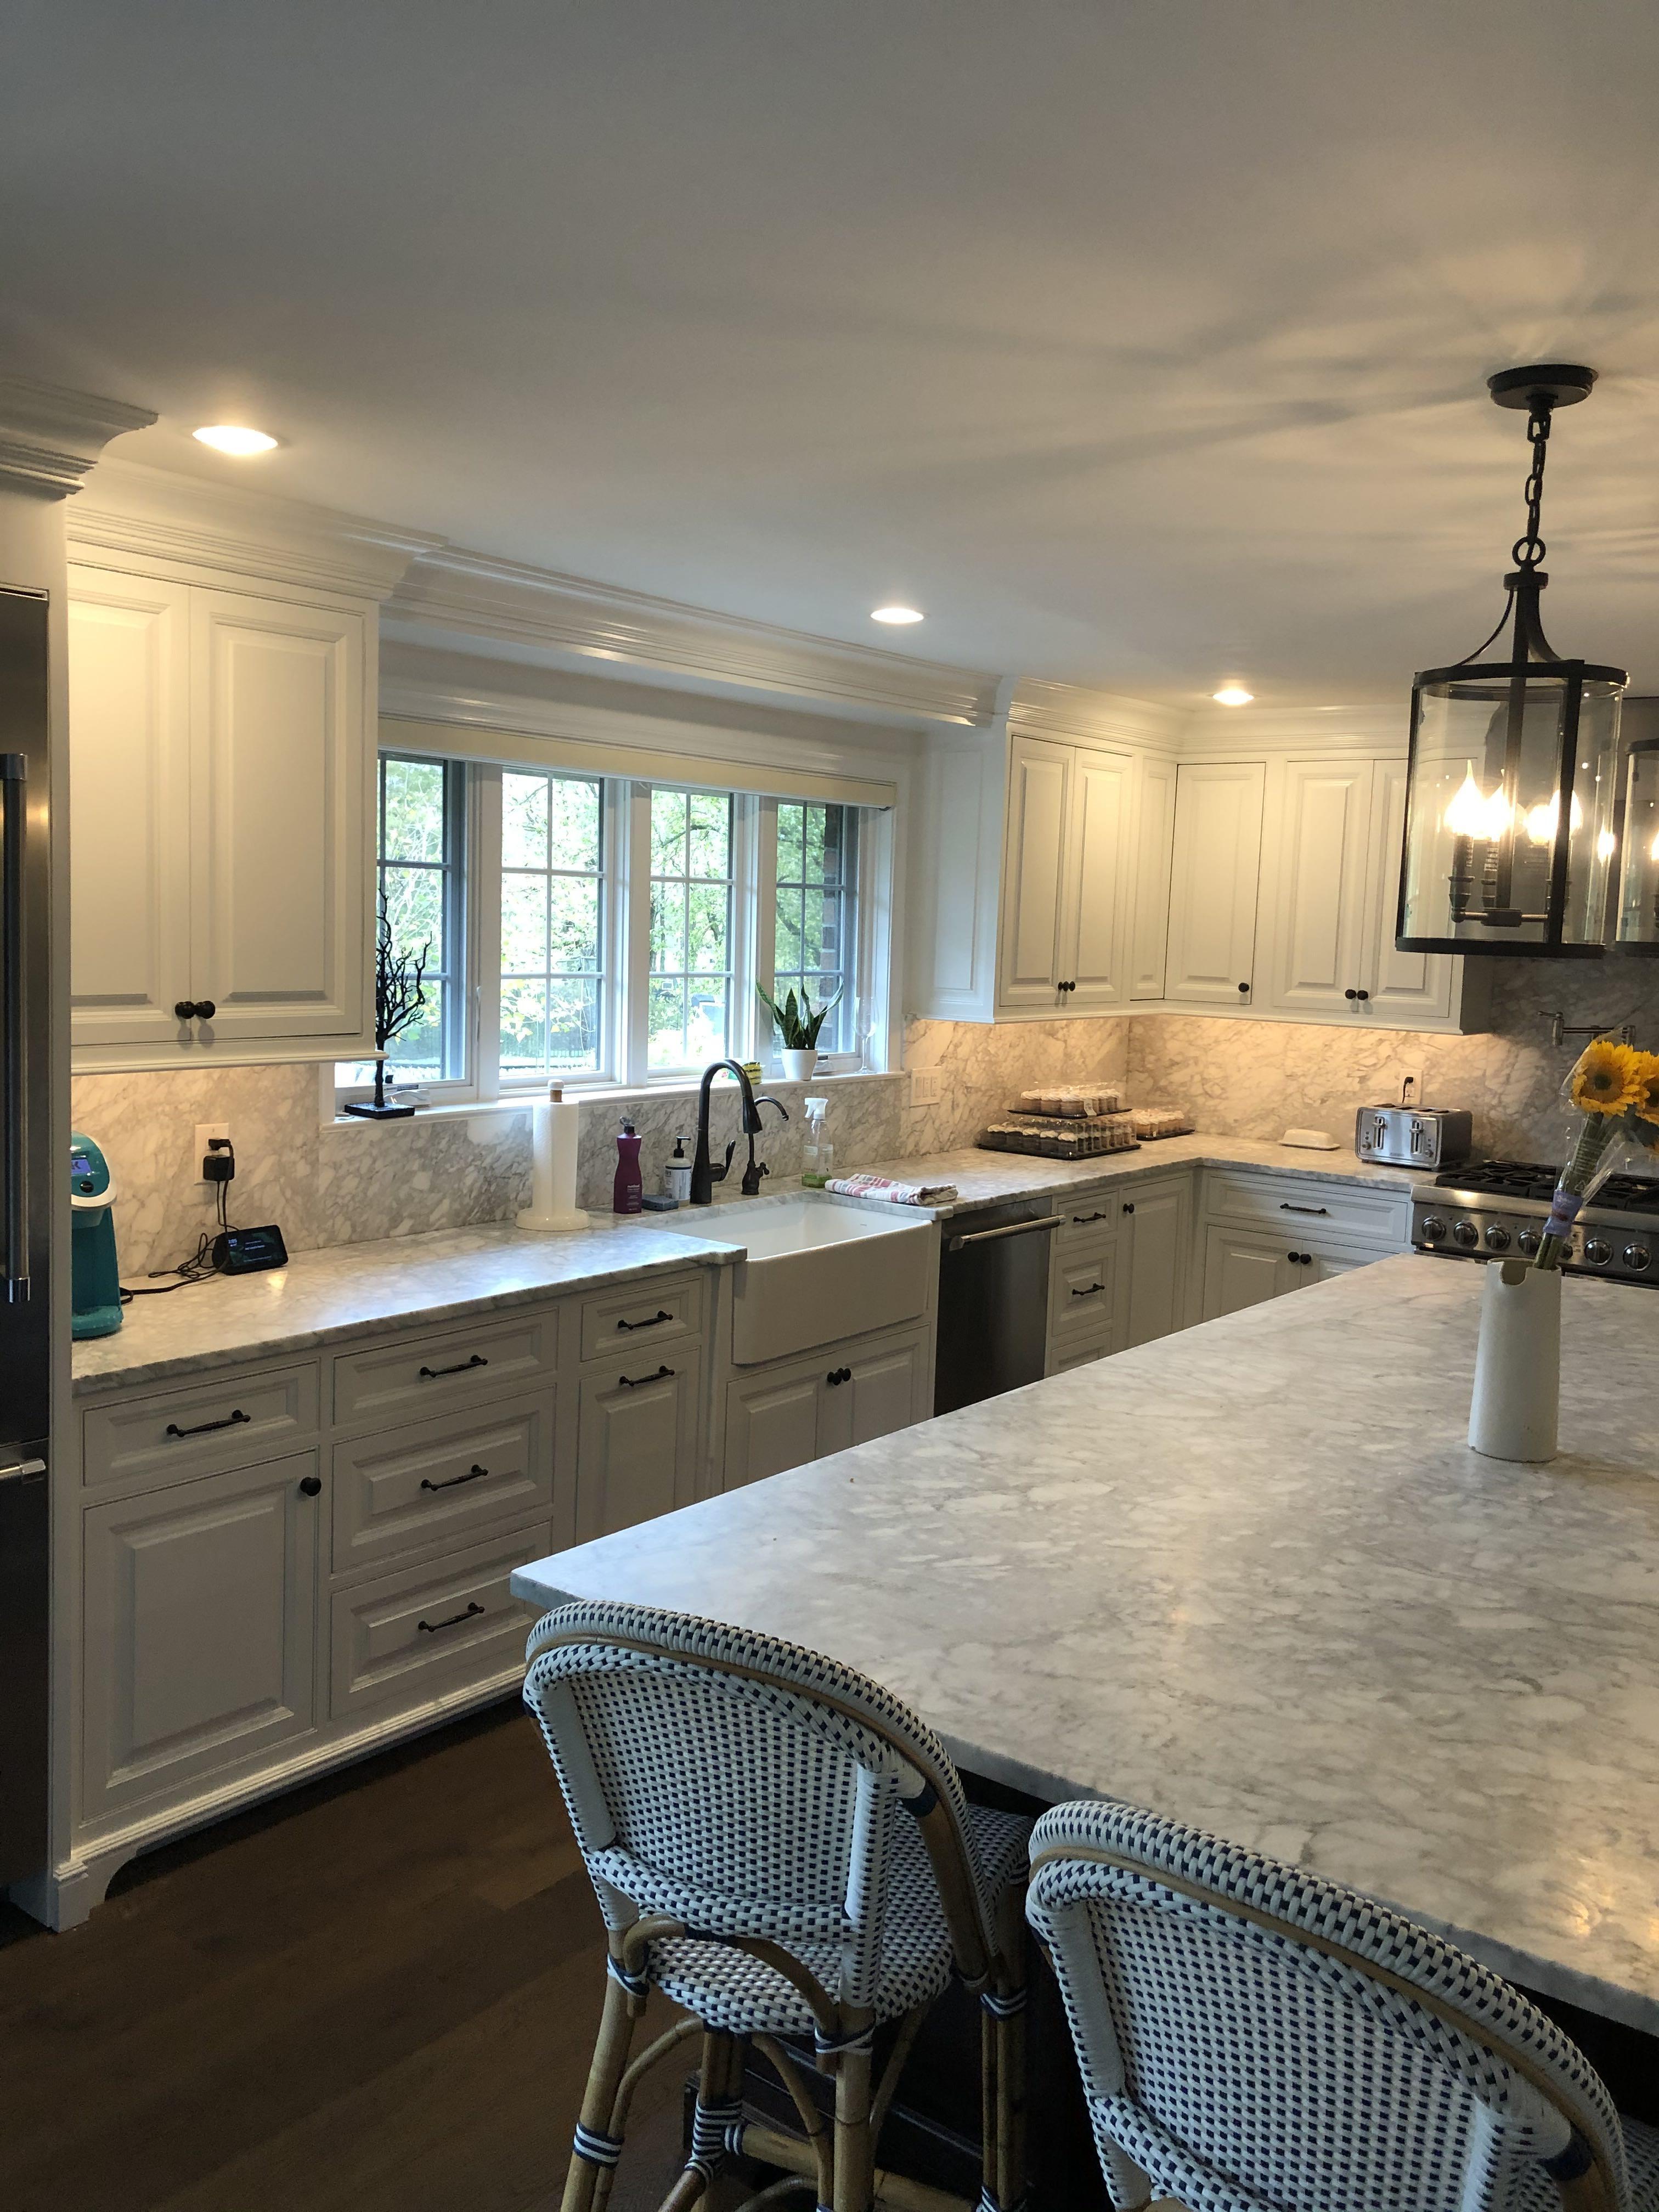 Painting Kitchen Cabinets to Finish Ambler Renovation ...